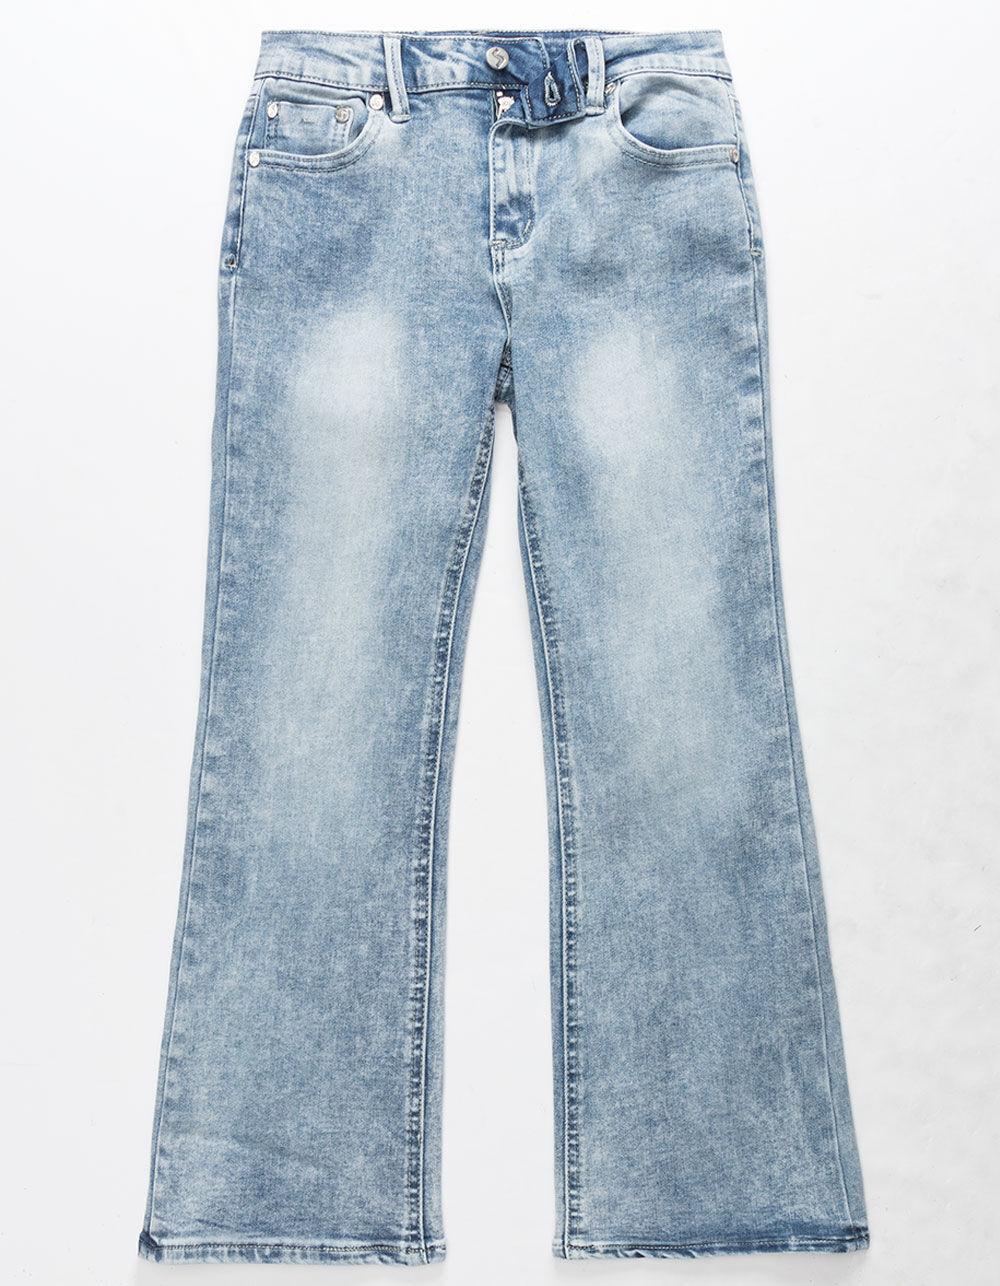 SCISSOR Crop Light Wash Girls Flare Jeans